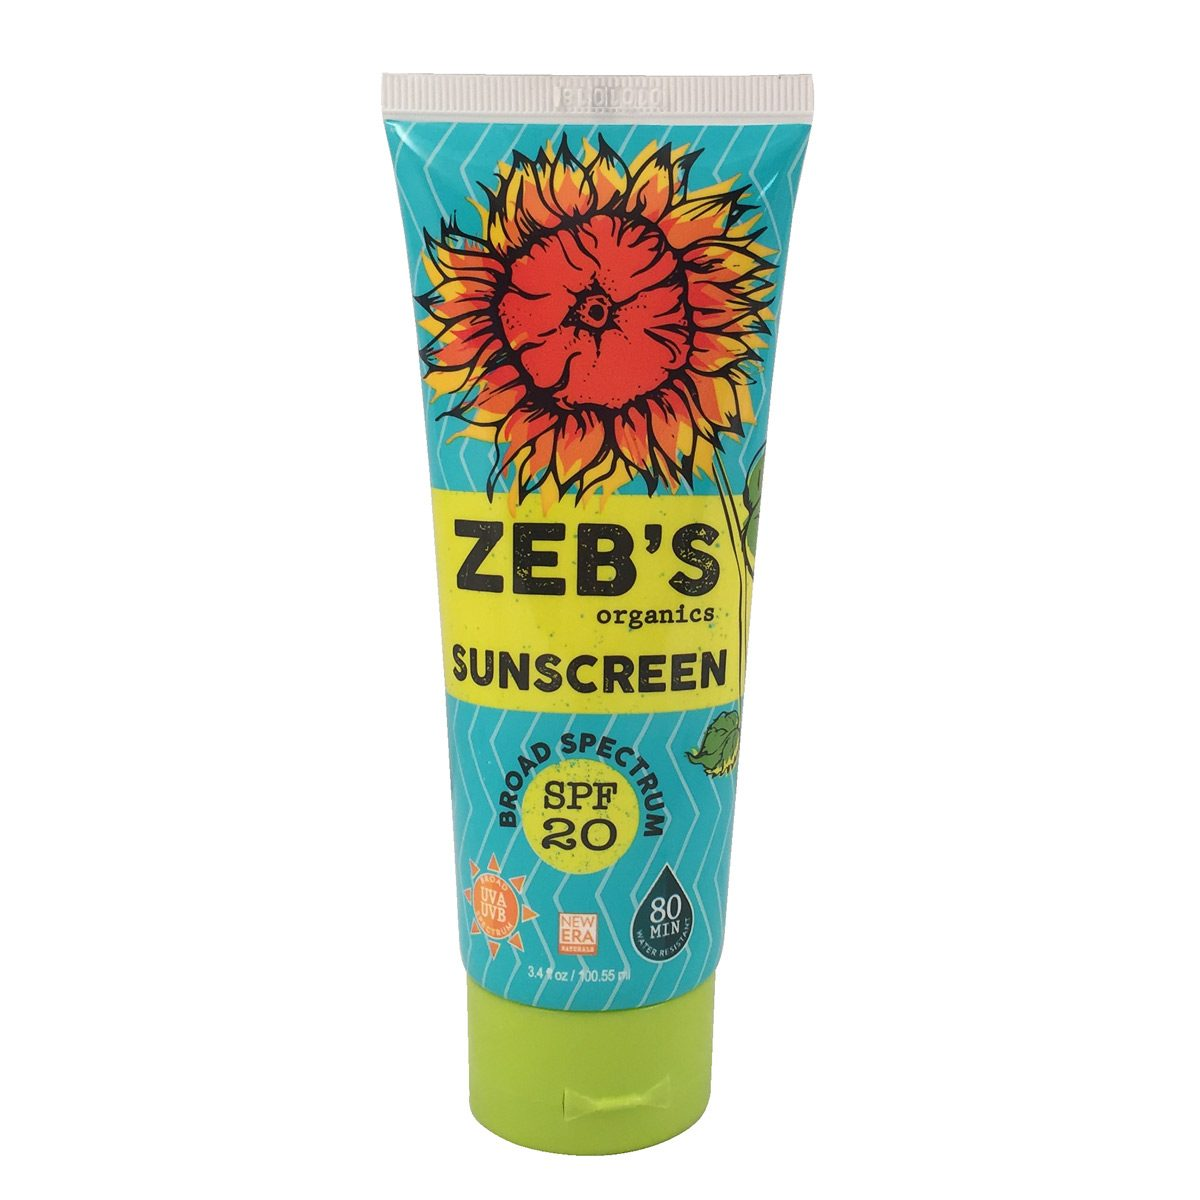 Zeb's sunscreen